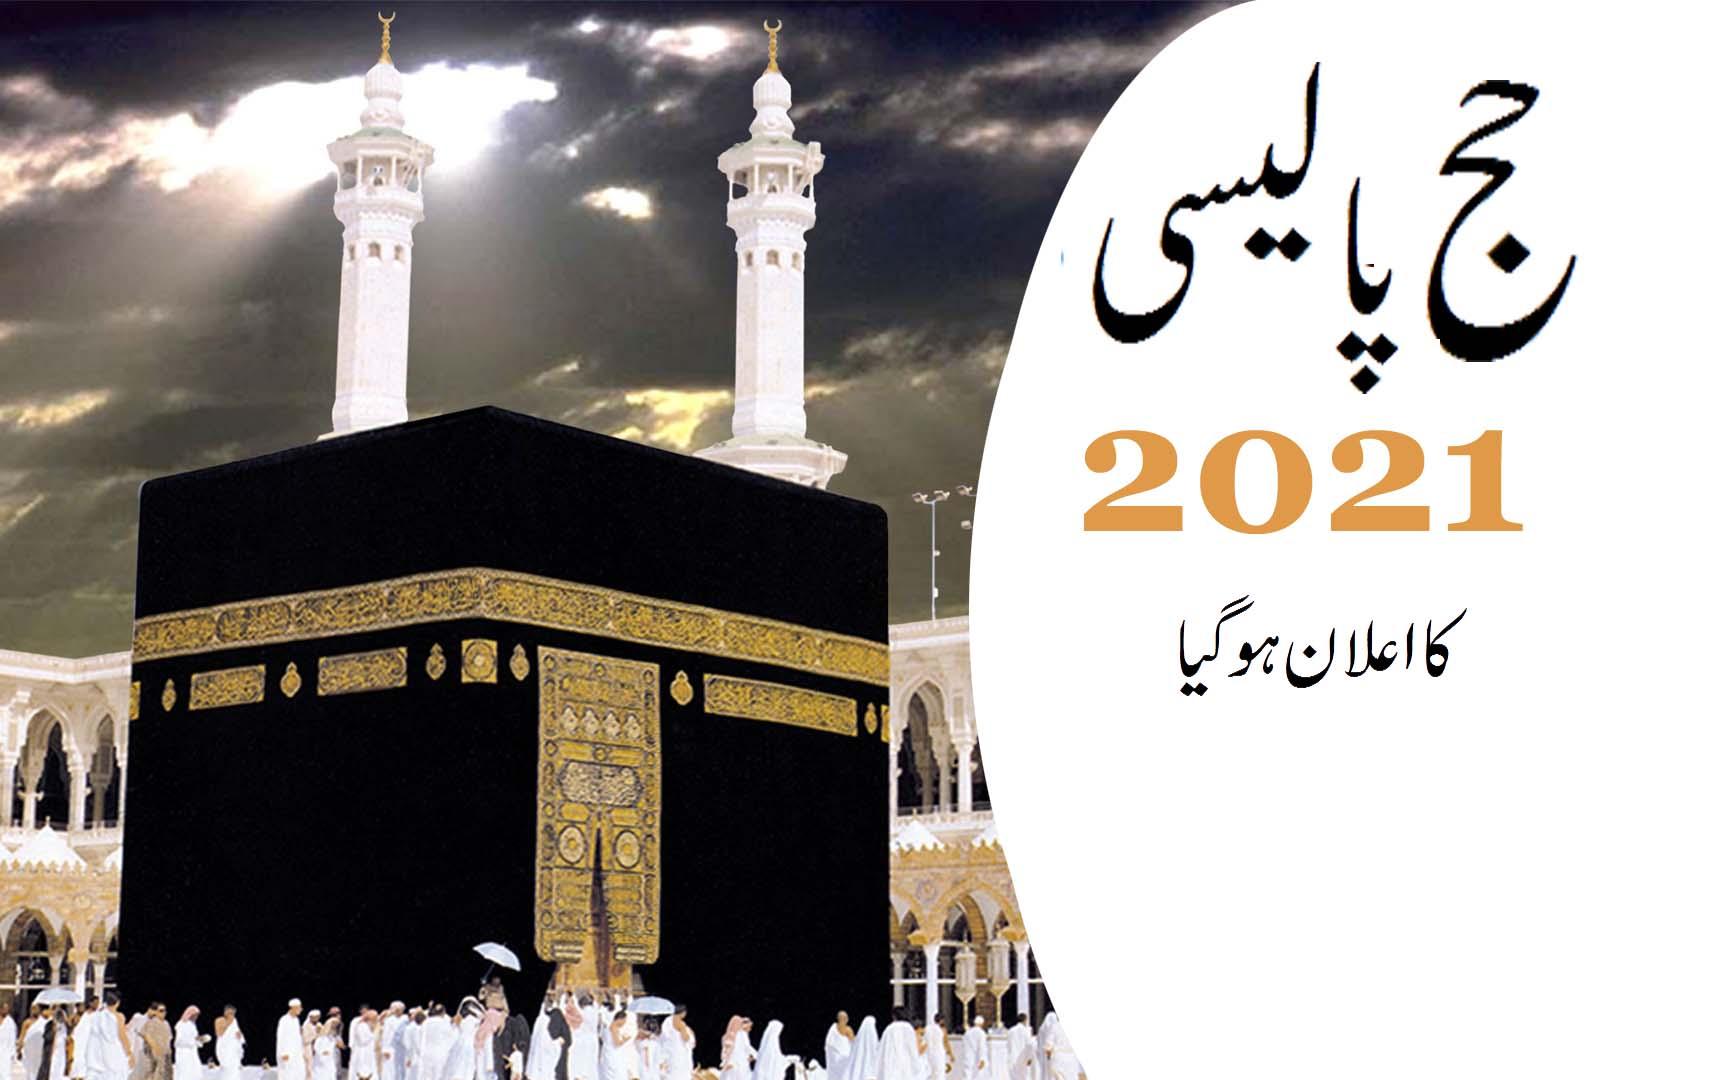 Hajj 2021 applications